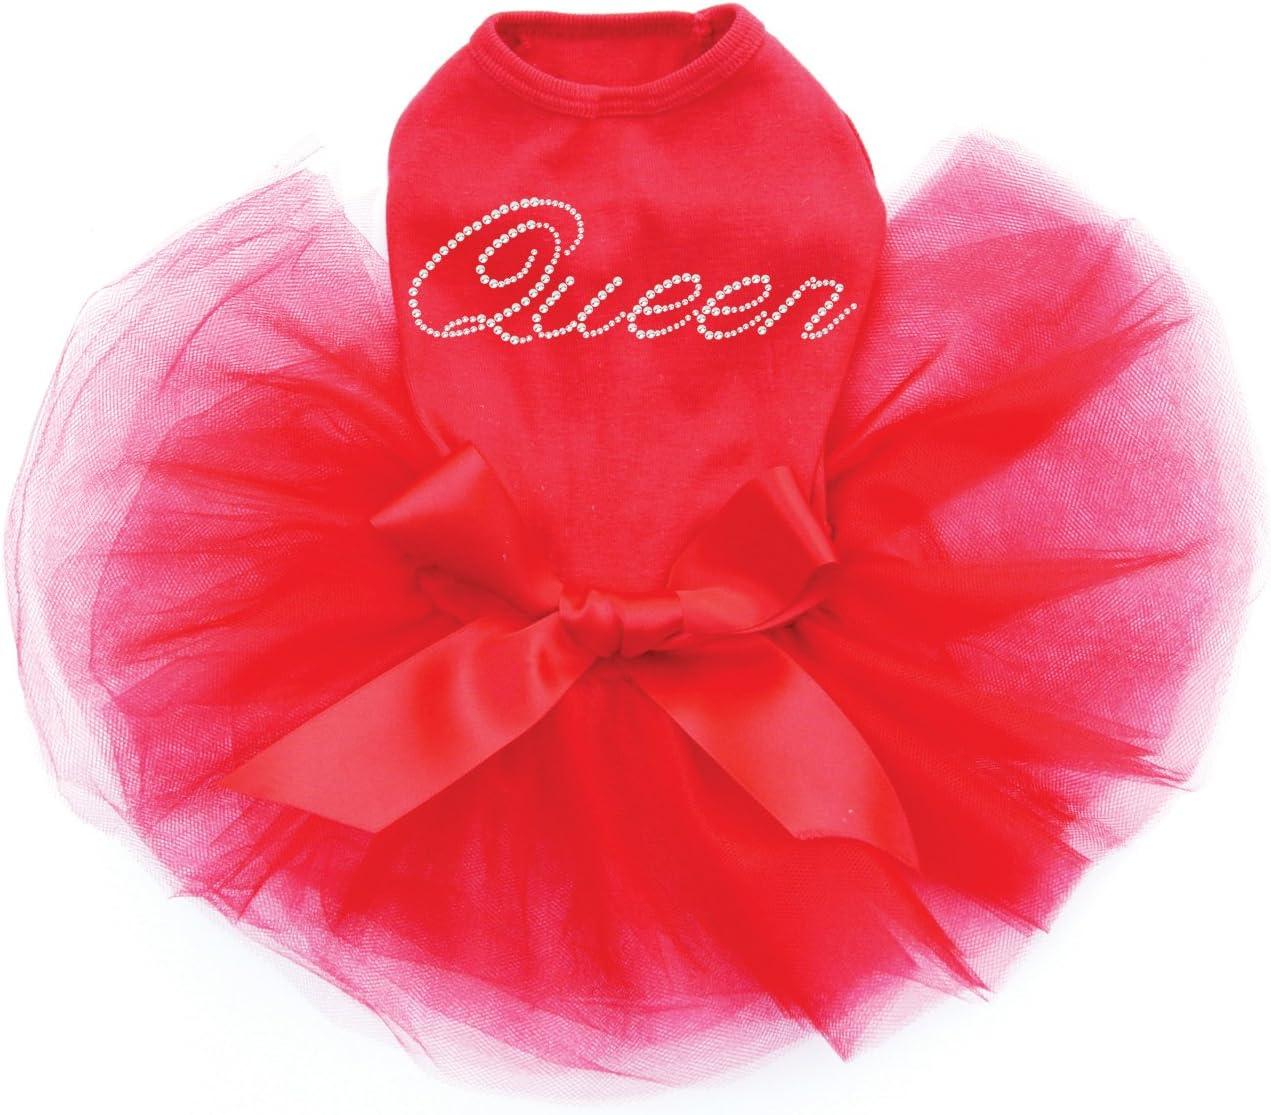 Queen - Dog 4 years warranty Super sale Tutu Red L Dress